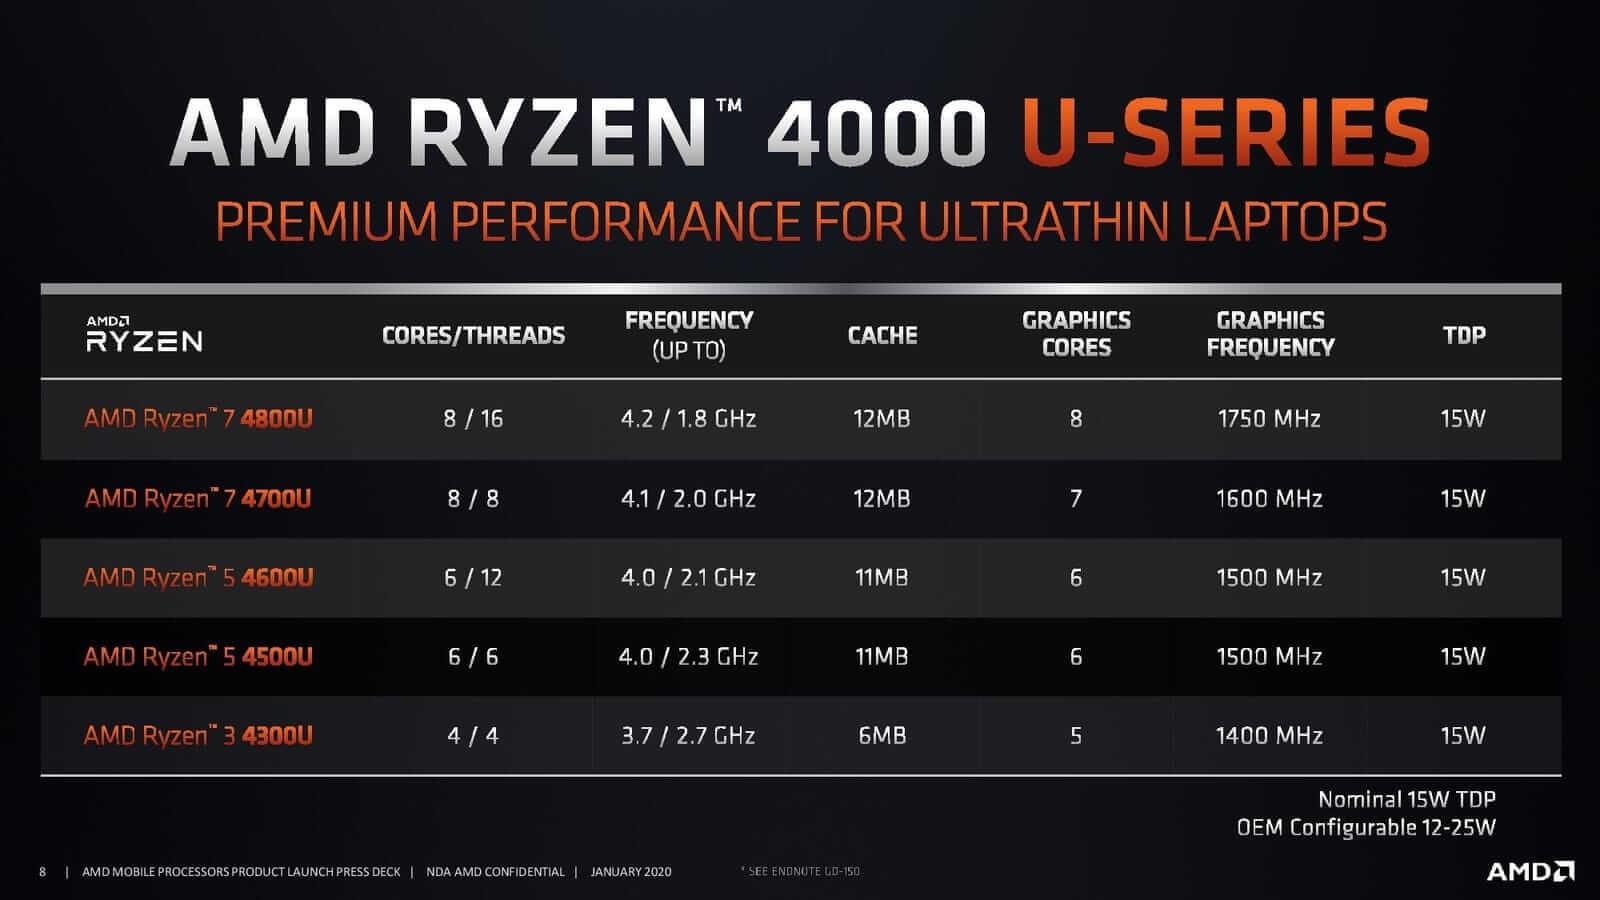 Ryzen 4000 U Series